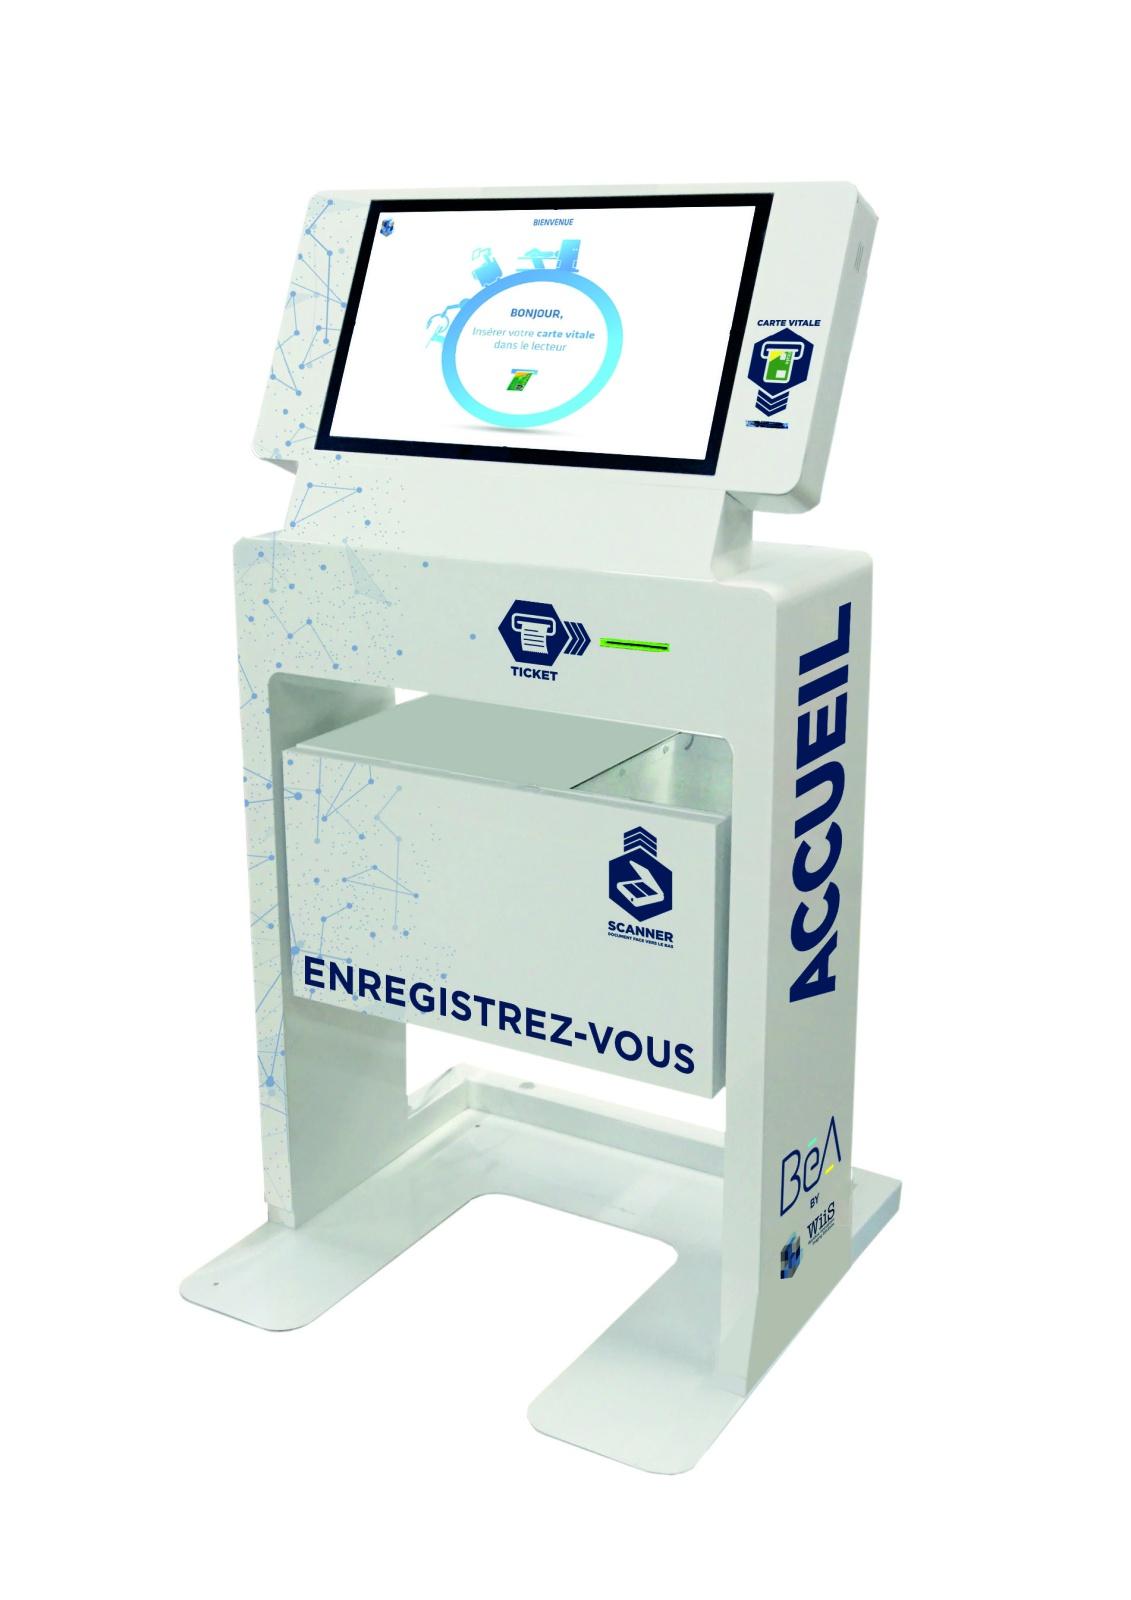 Borne tatcile interactive IPM FRANCE & Wiis Laboratoire